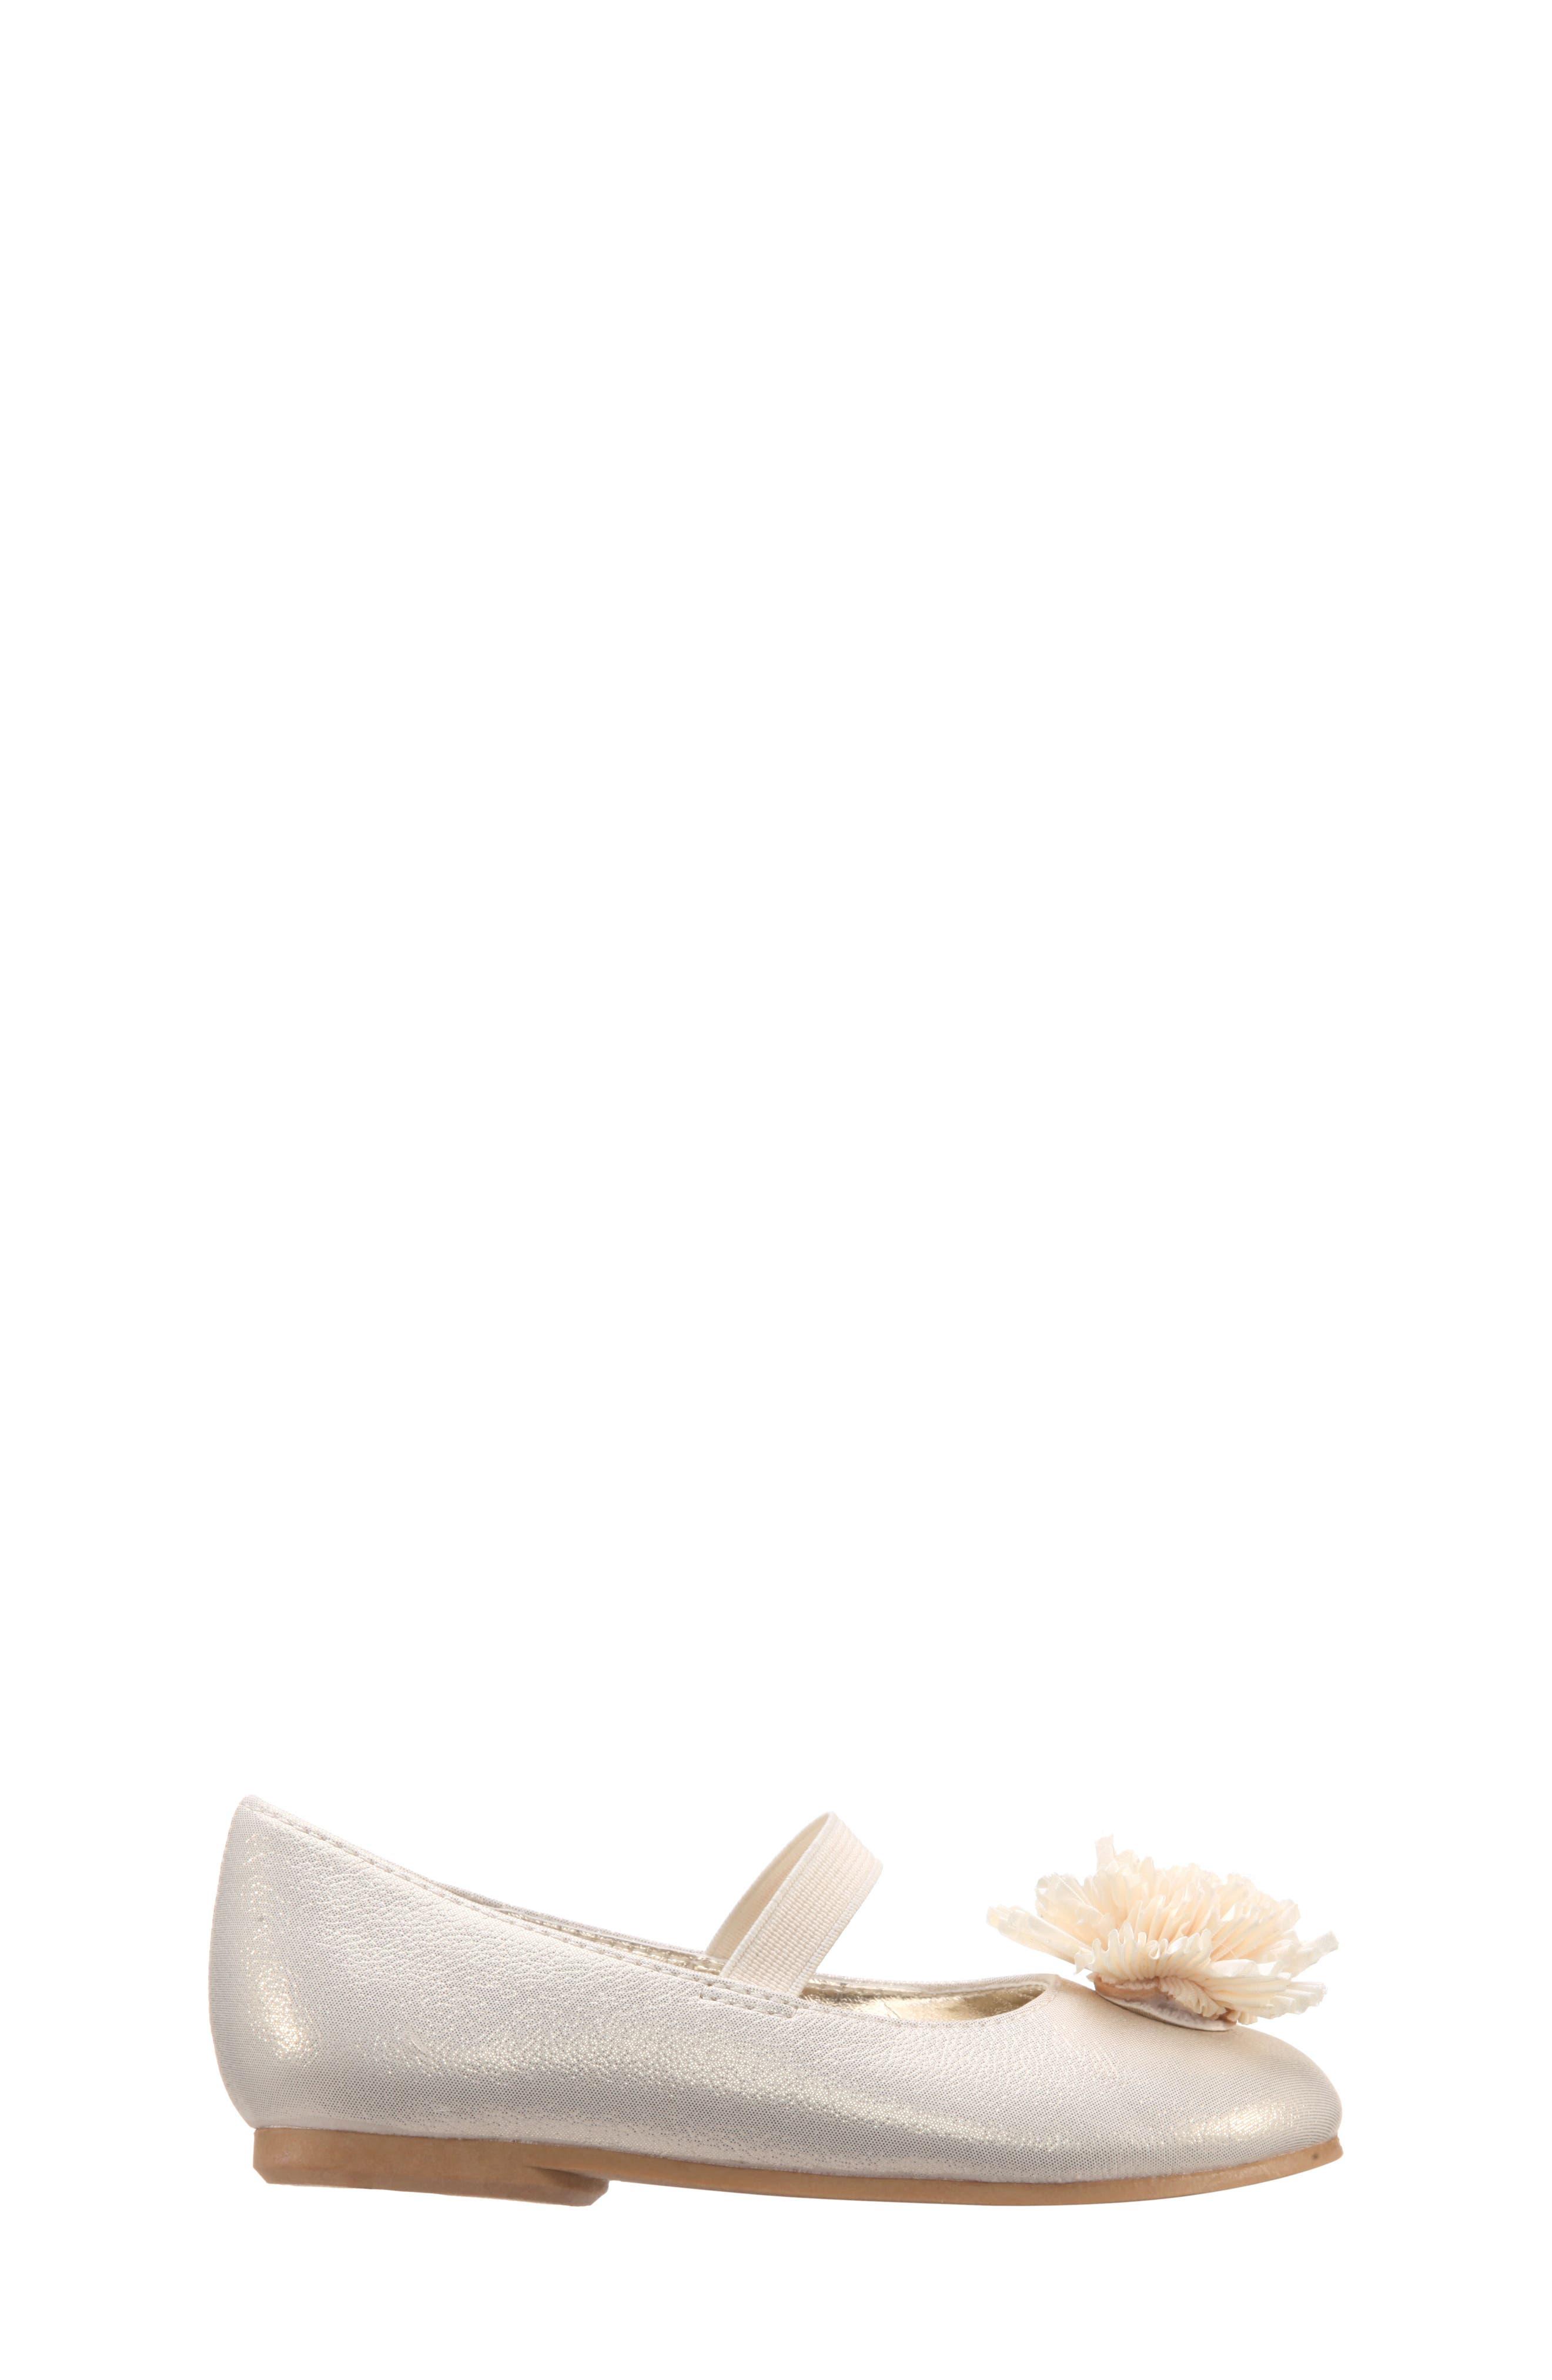 Jemma-T Bow Ballet Flat,                             Alternate thumbnail 3, color,                             Platino Metallic